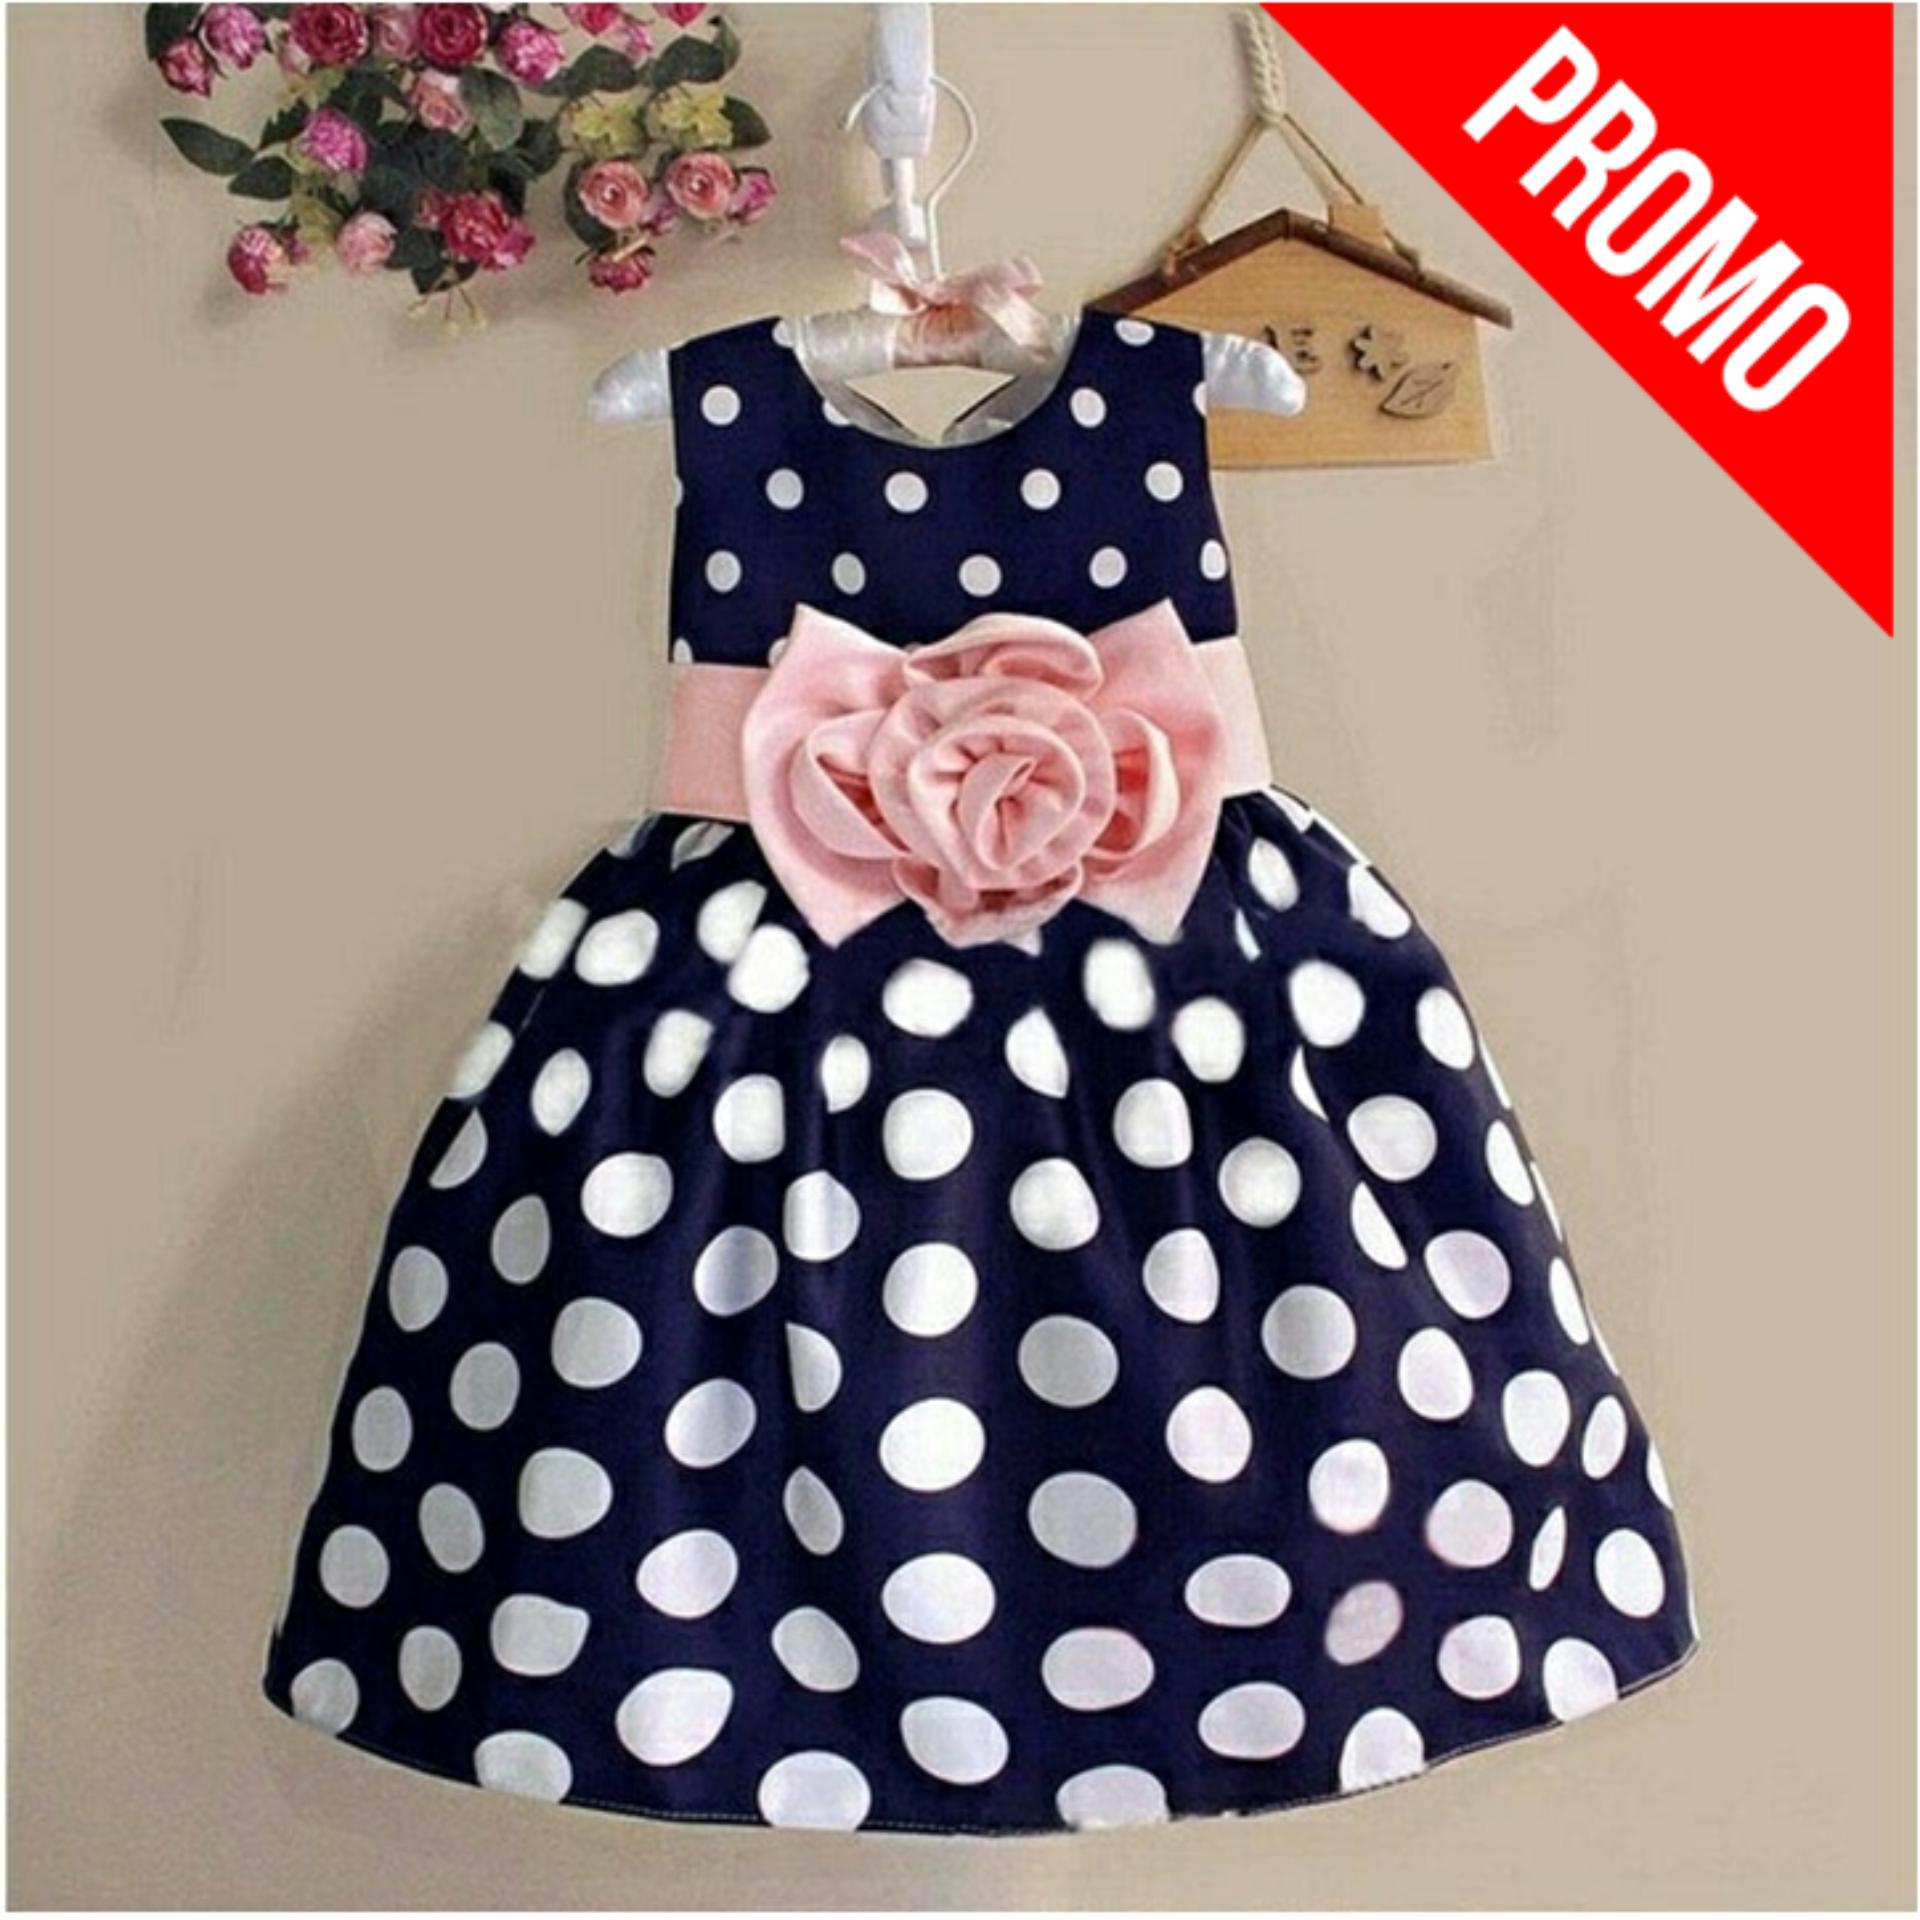 Dress anak | Baju anak | Pakaian anak Polka